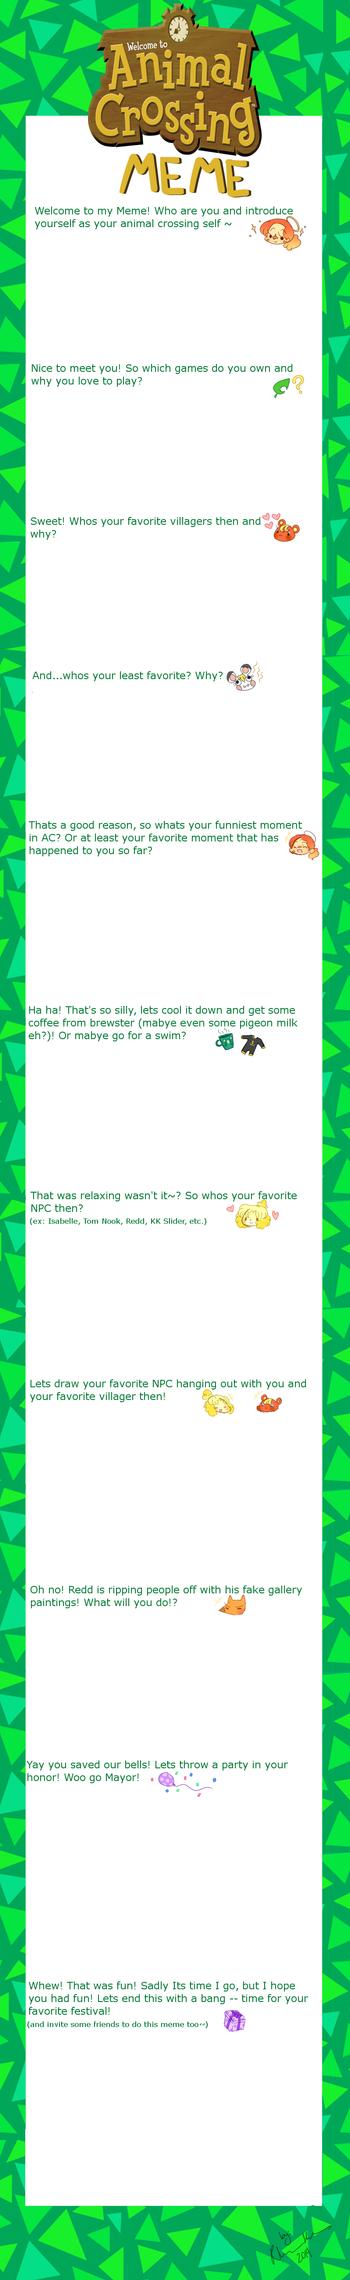 Animal Crossing Meme by Ruhianna